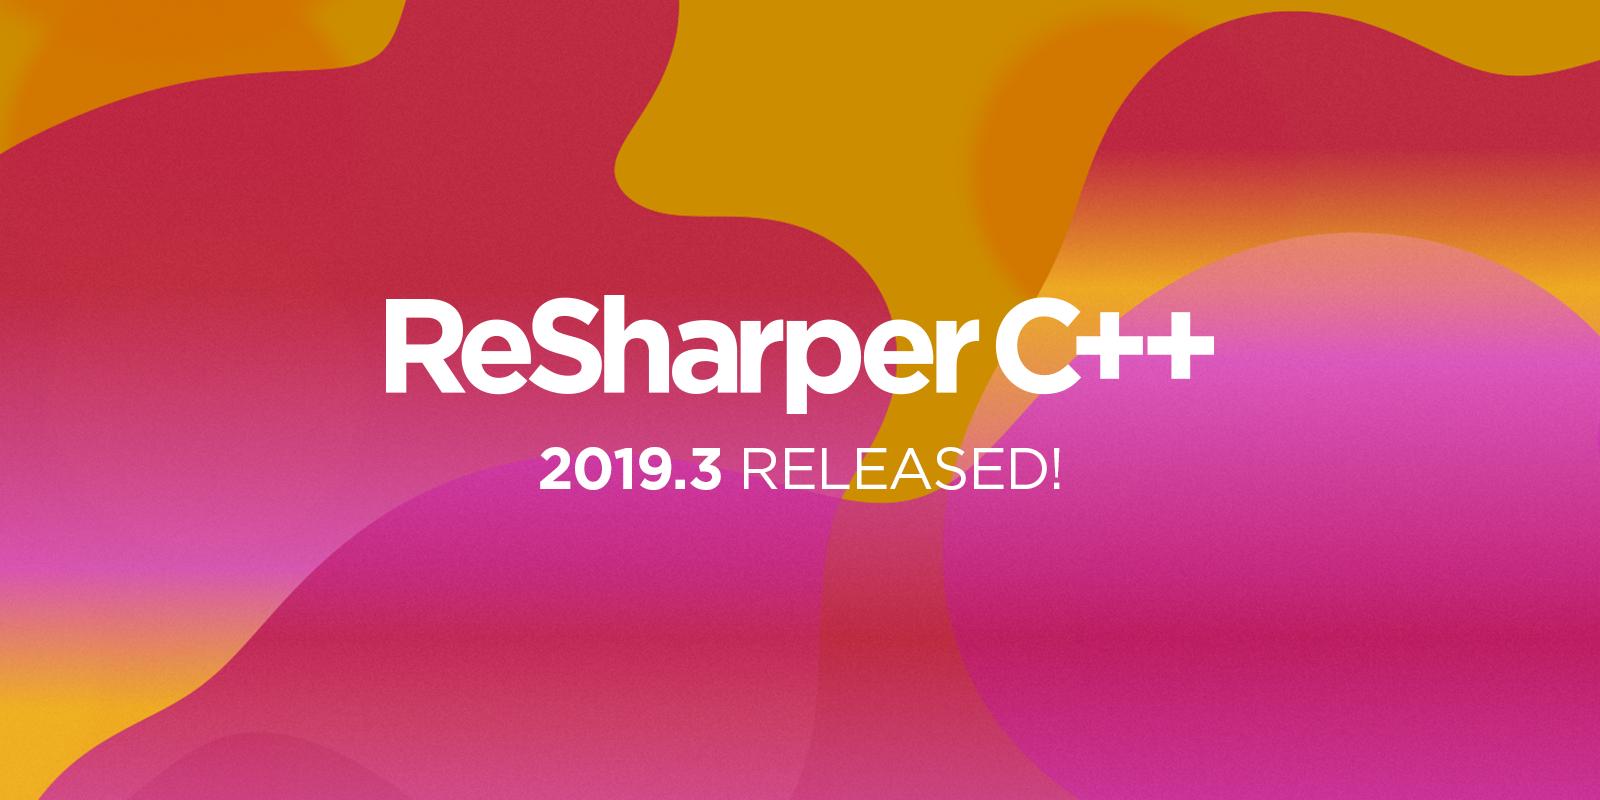 ReSharper C++ 2019.3